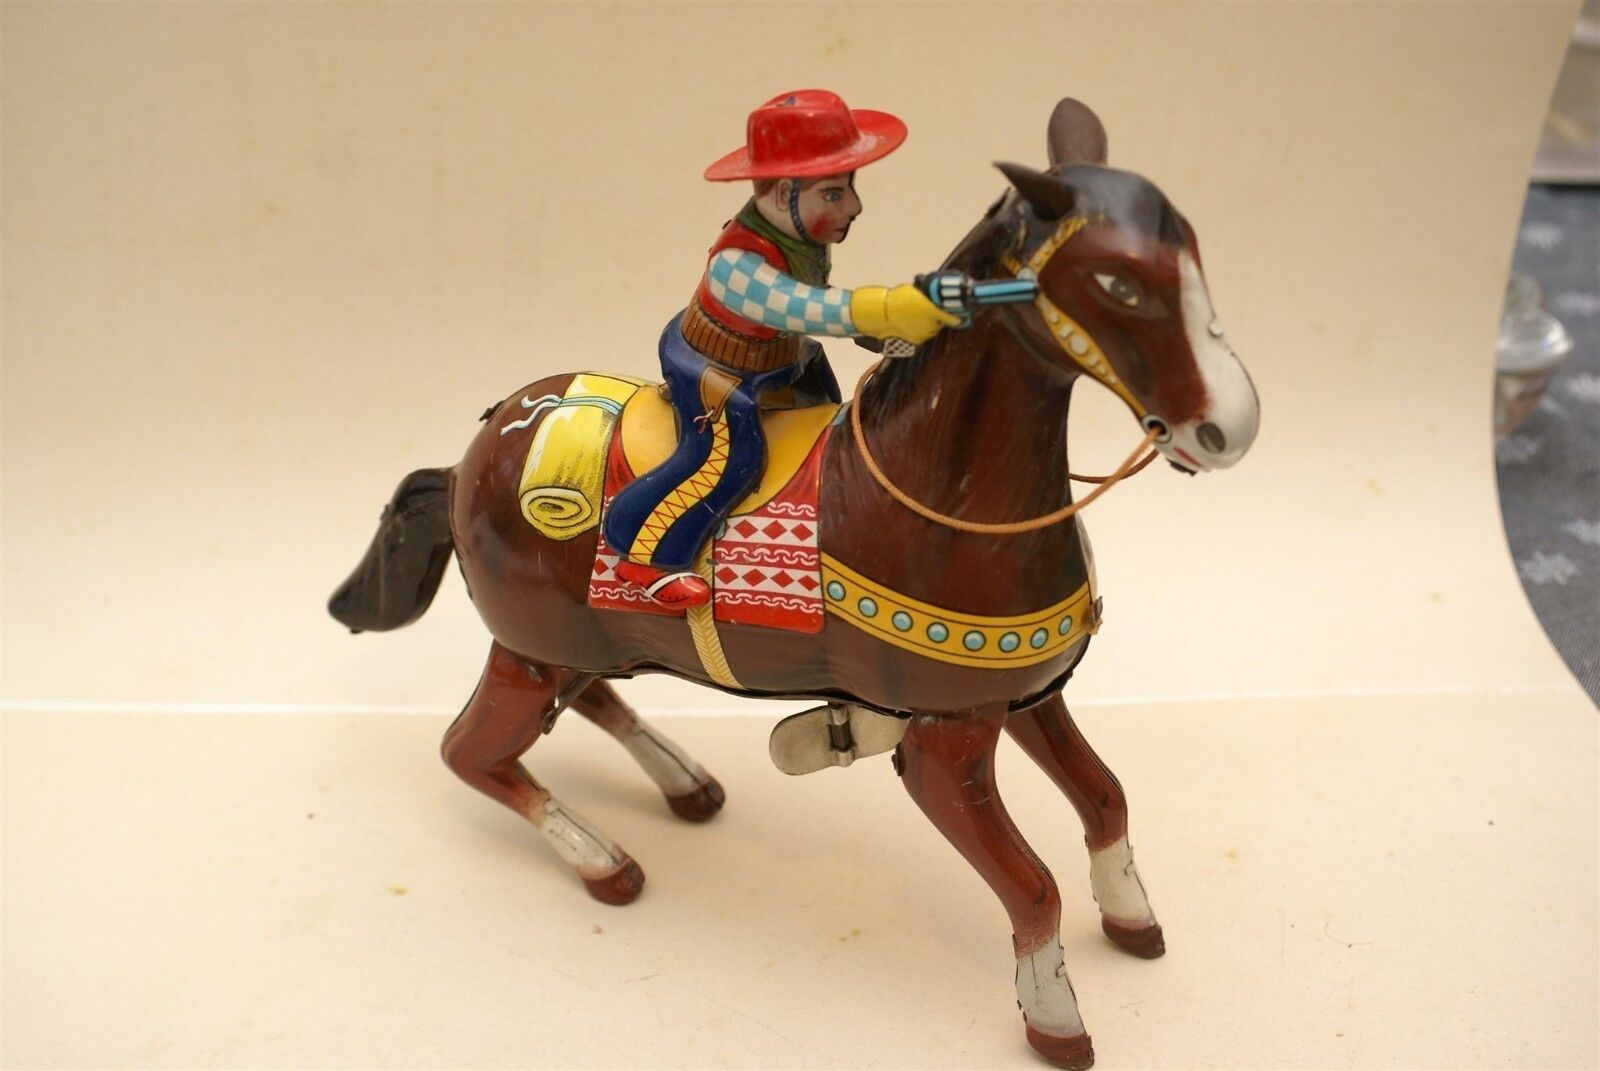 Haji cowboy on horse wind up   mint